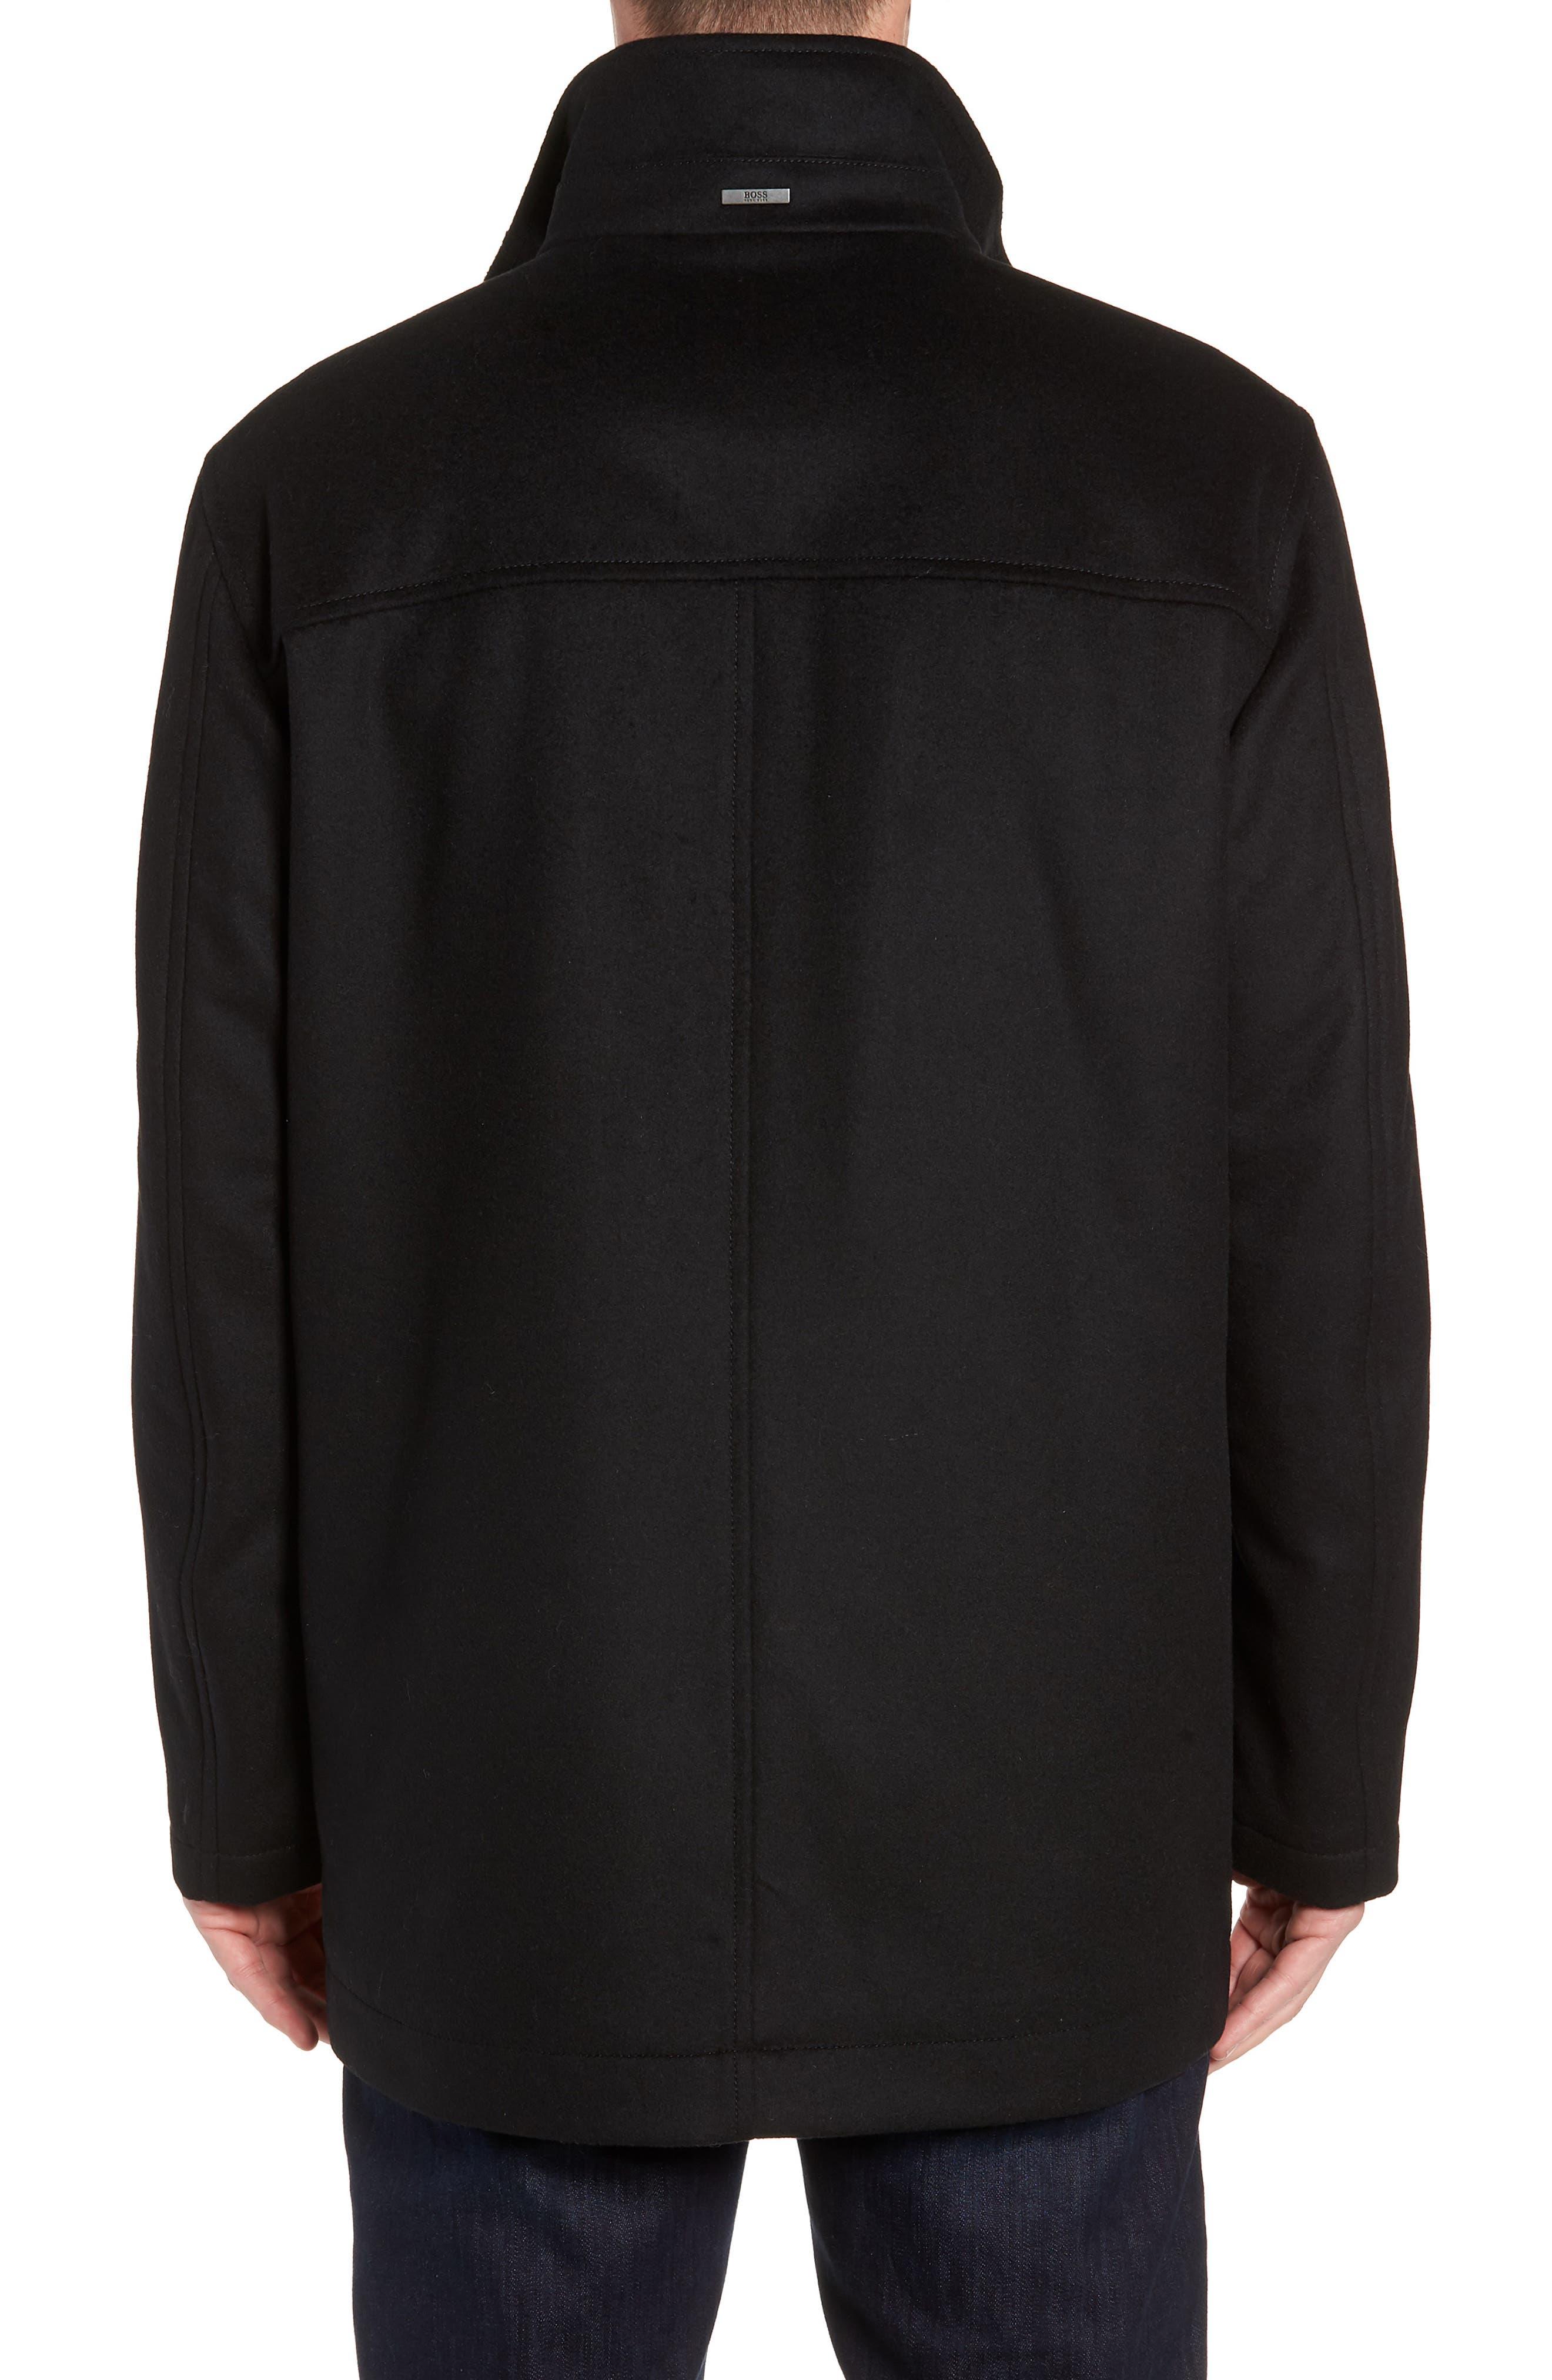 Coxtan Wool Regular Fit Car Coat,                             Alternate thumbnail 2, color,                             BLACK